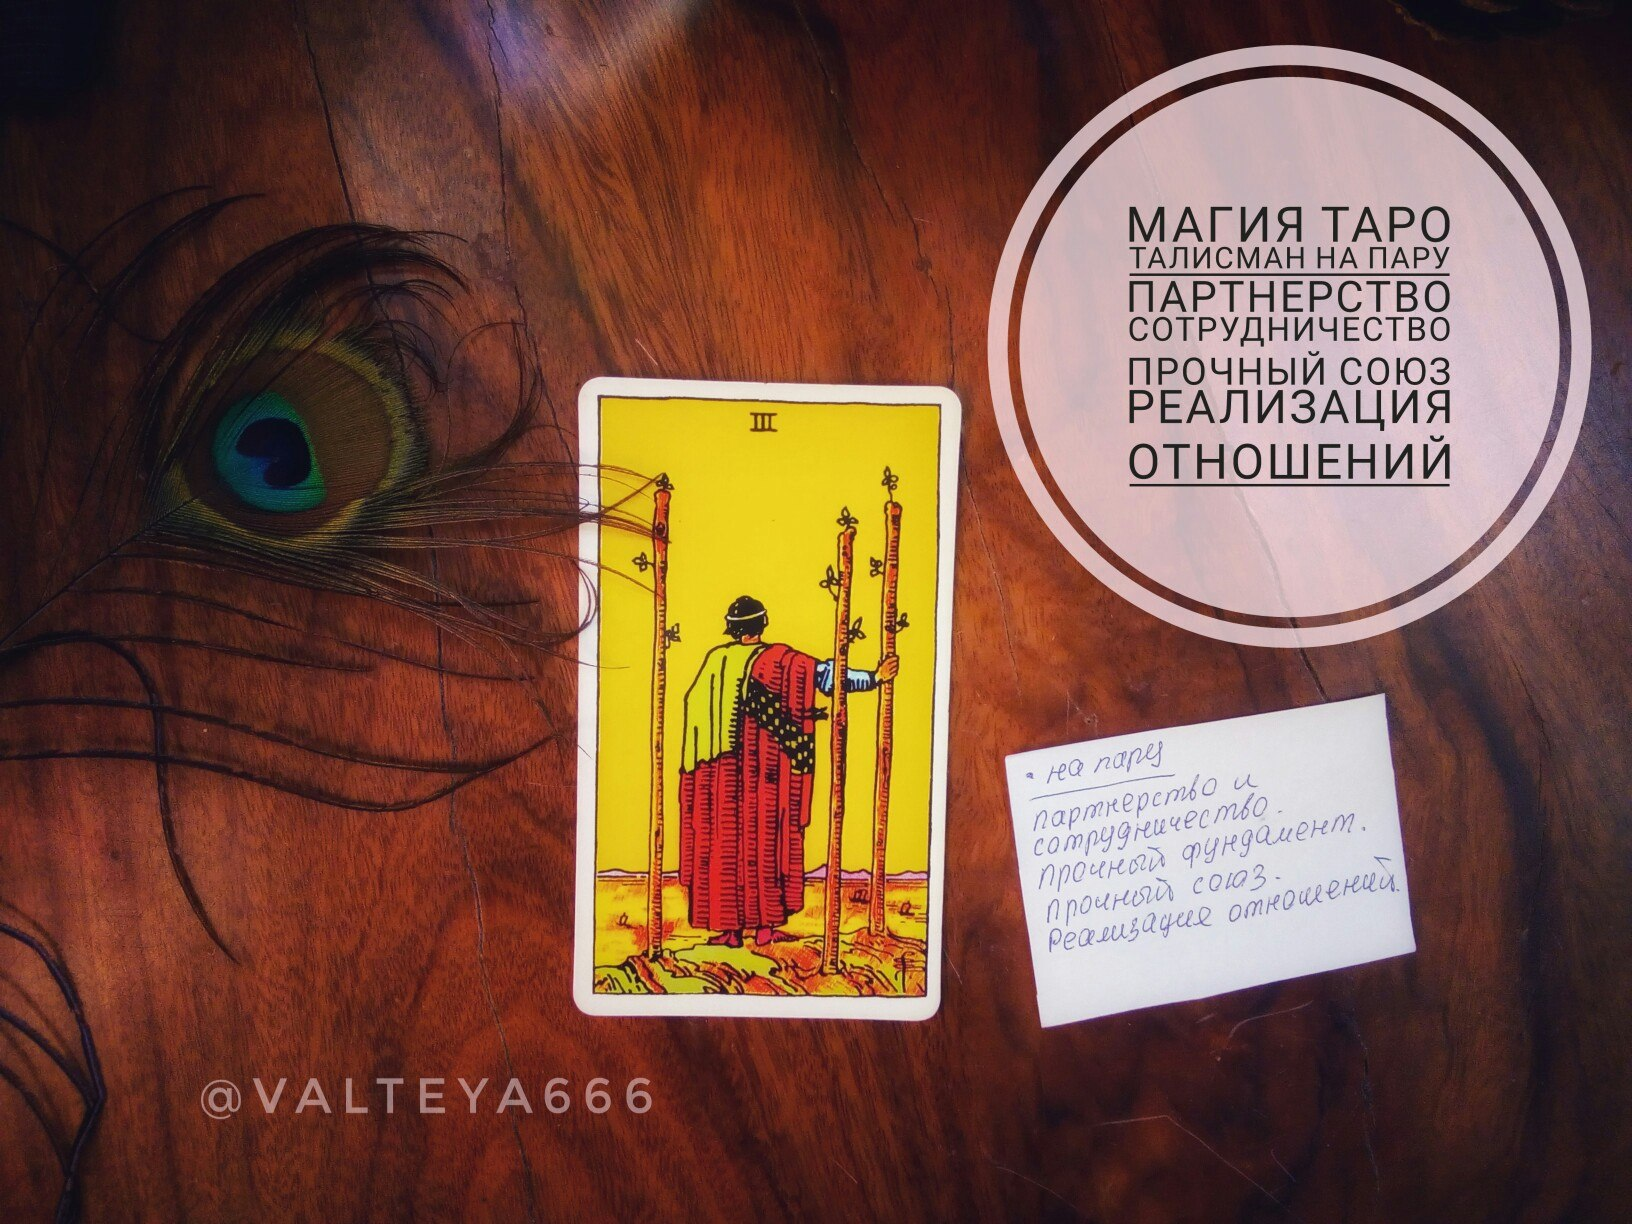 Хештег таро на   Салон Магии и мистики Елены Руденко ( Валтеи ). Киев ,тел: 0506251562  JHsKxu9UT4w